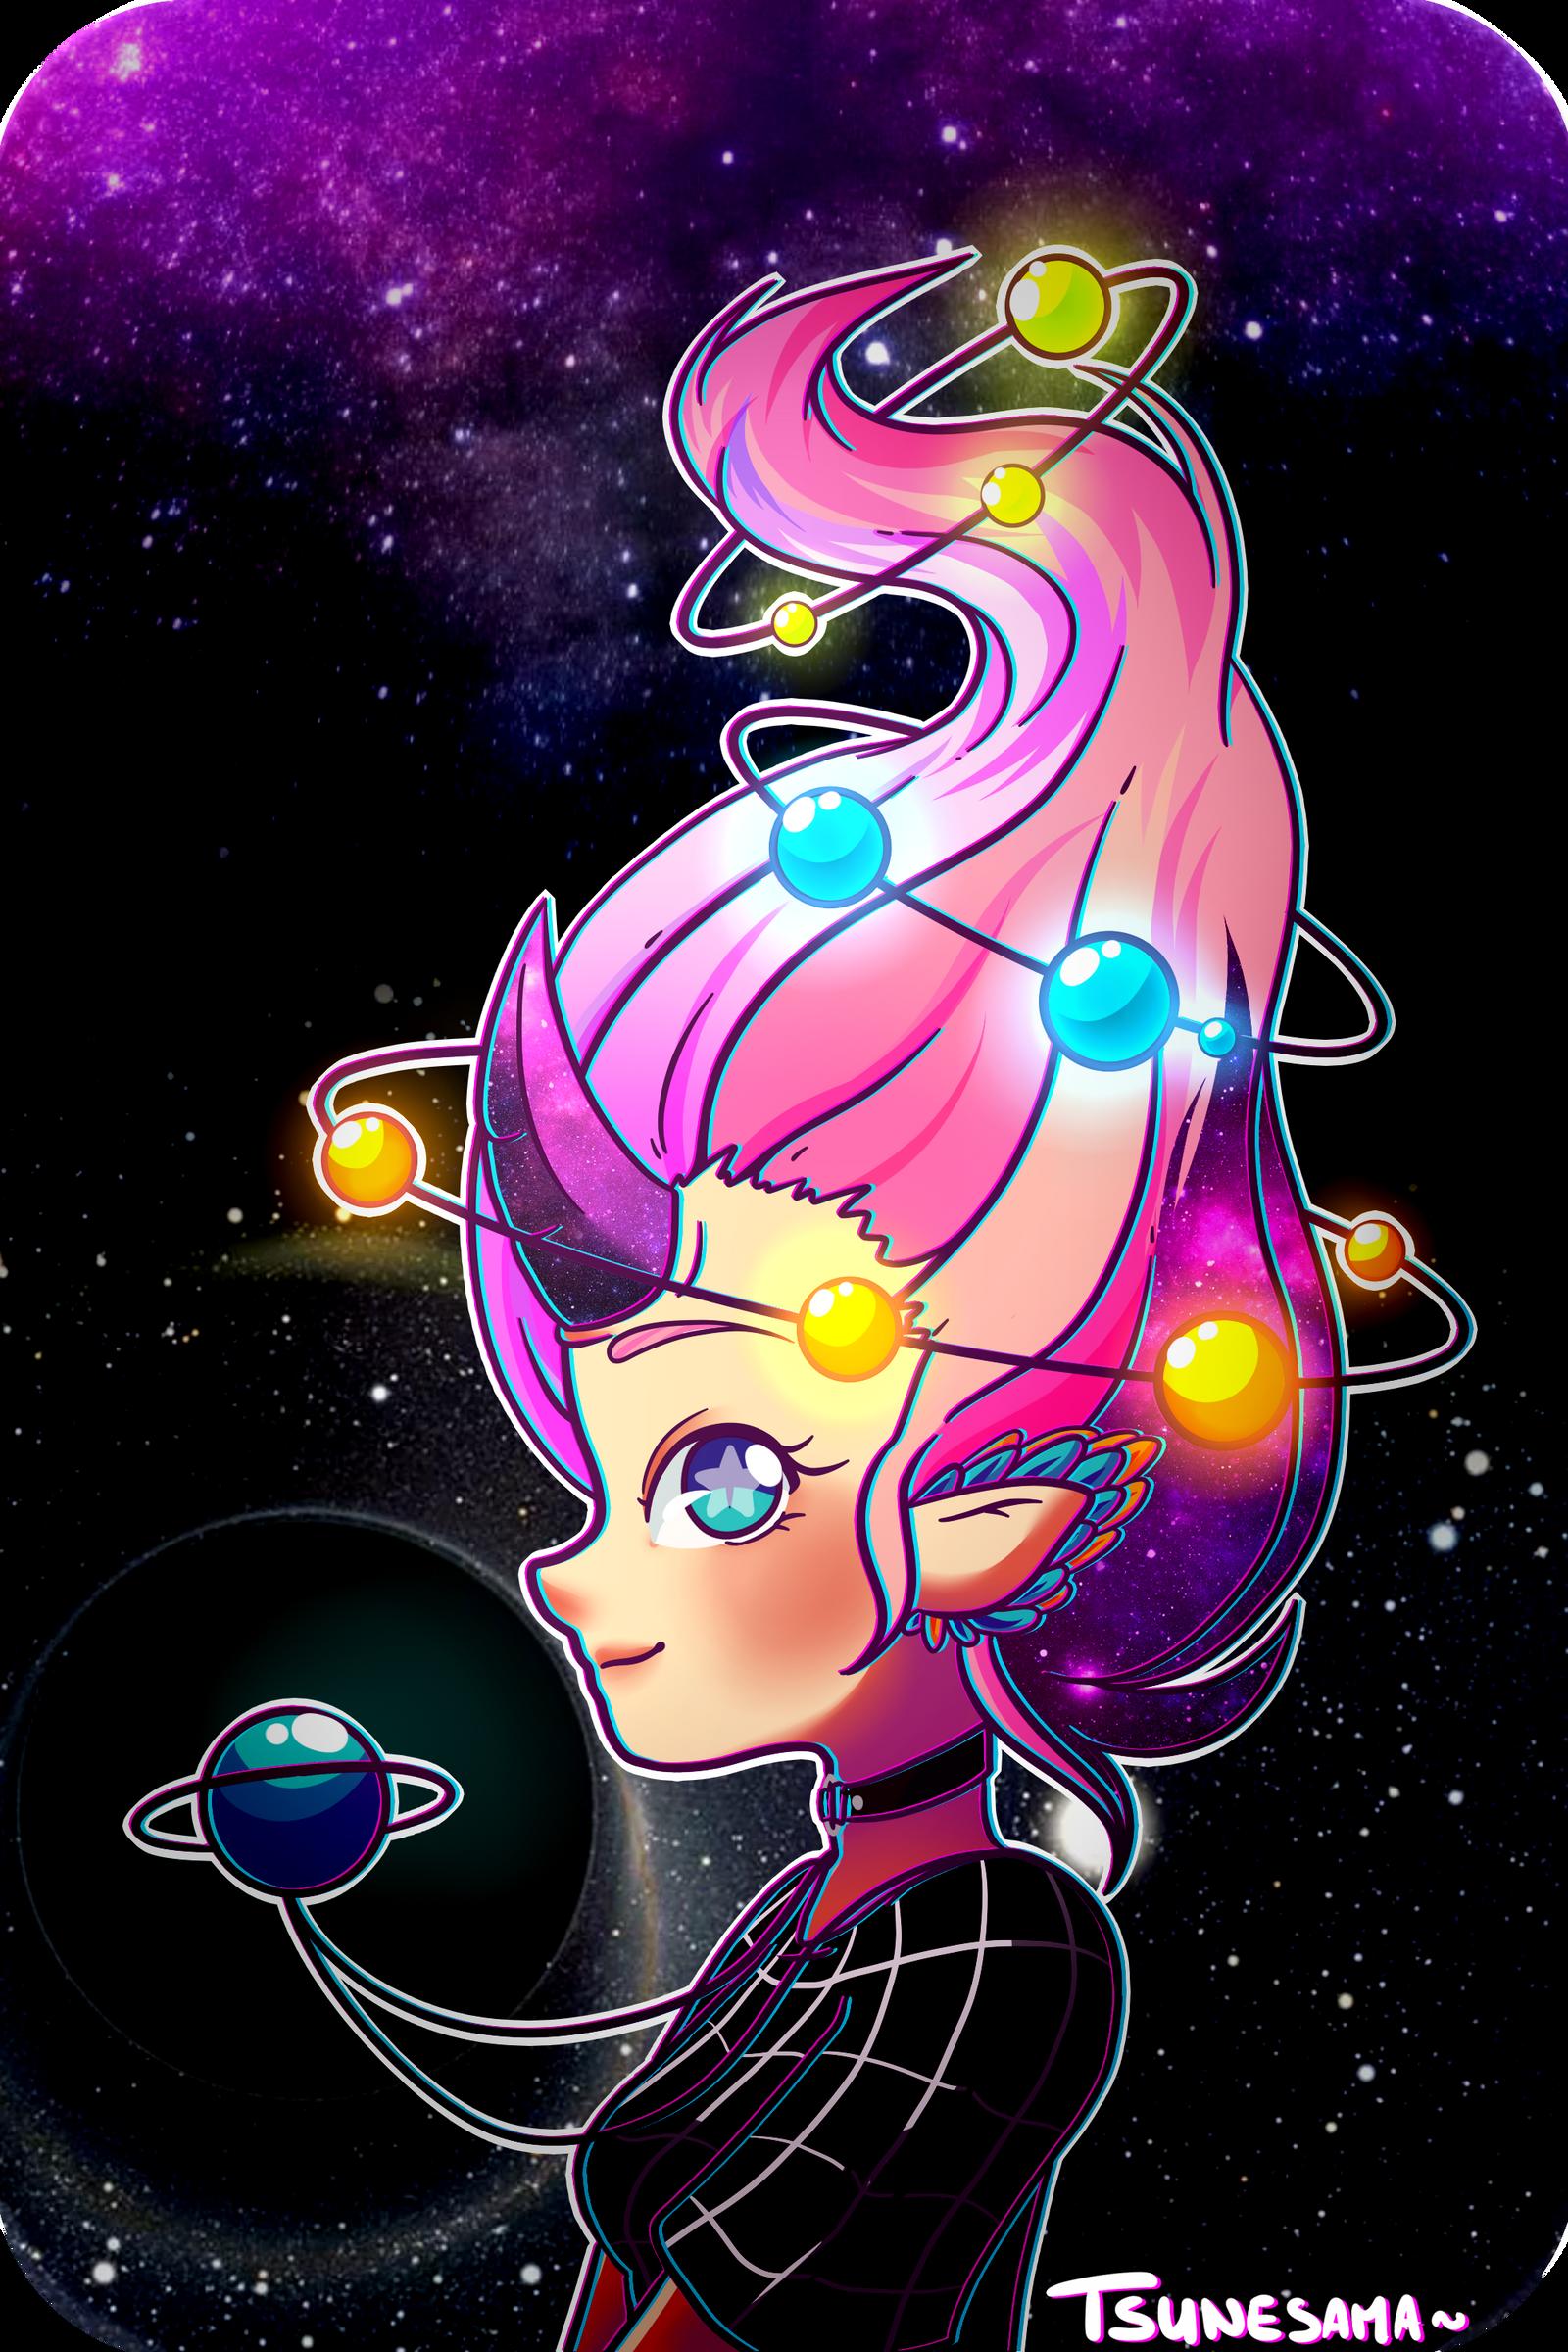 Space hair~ by Tsunesamaa